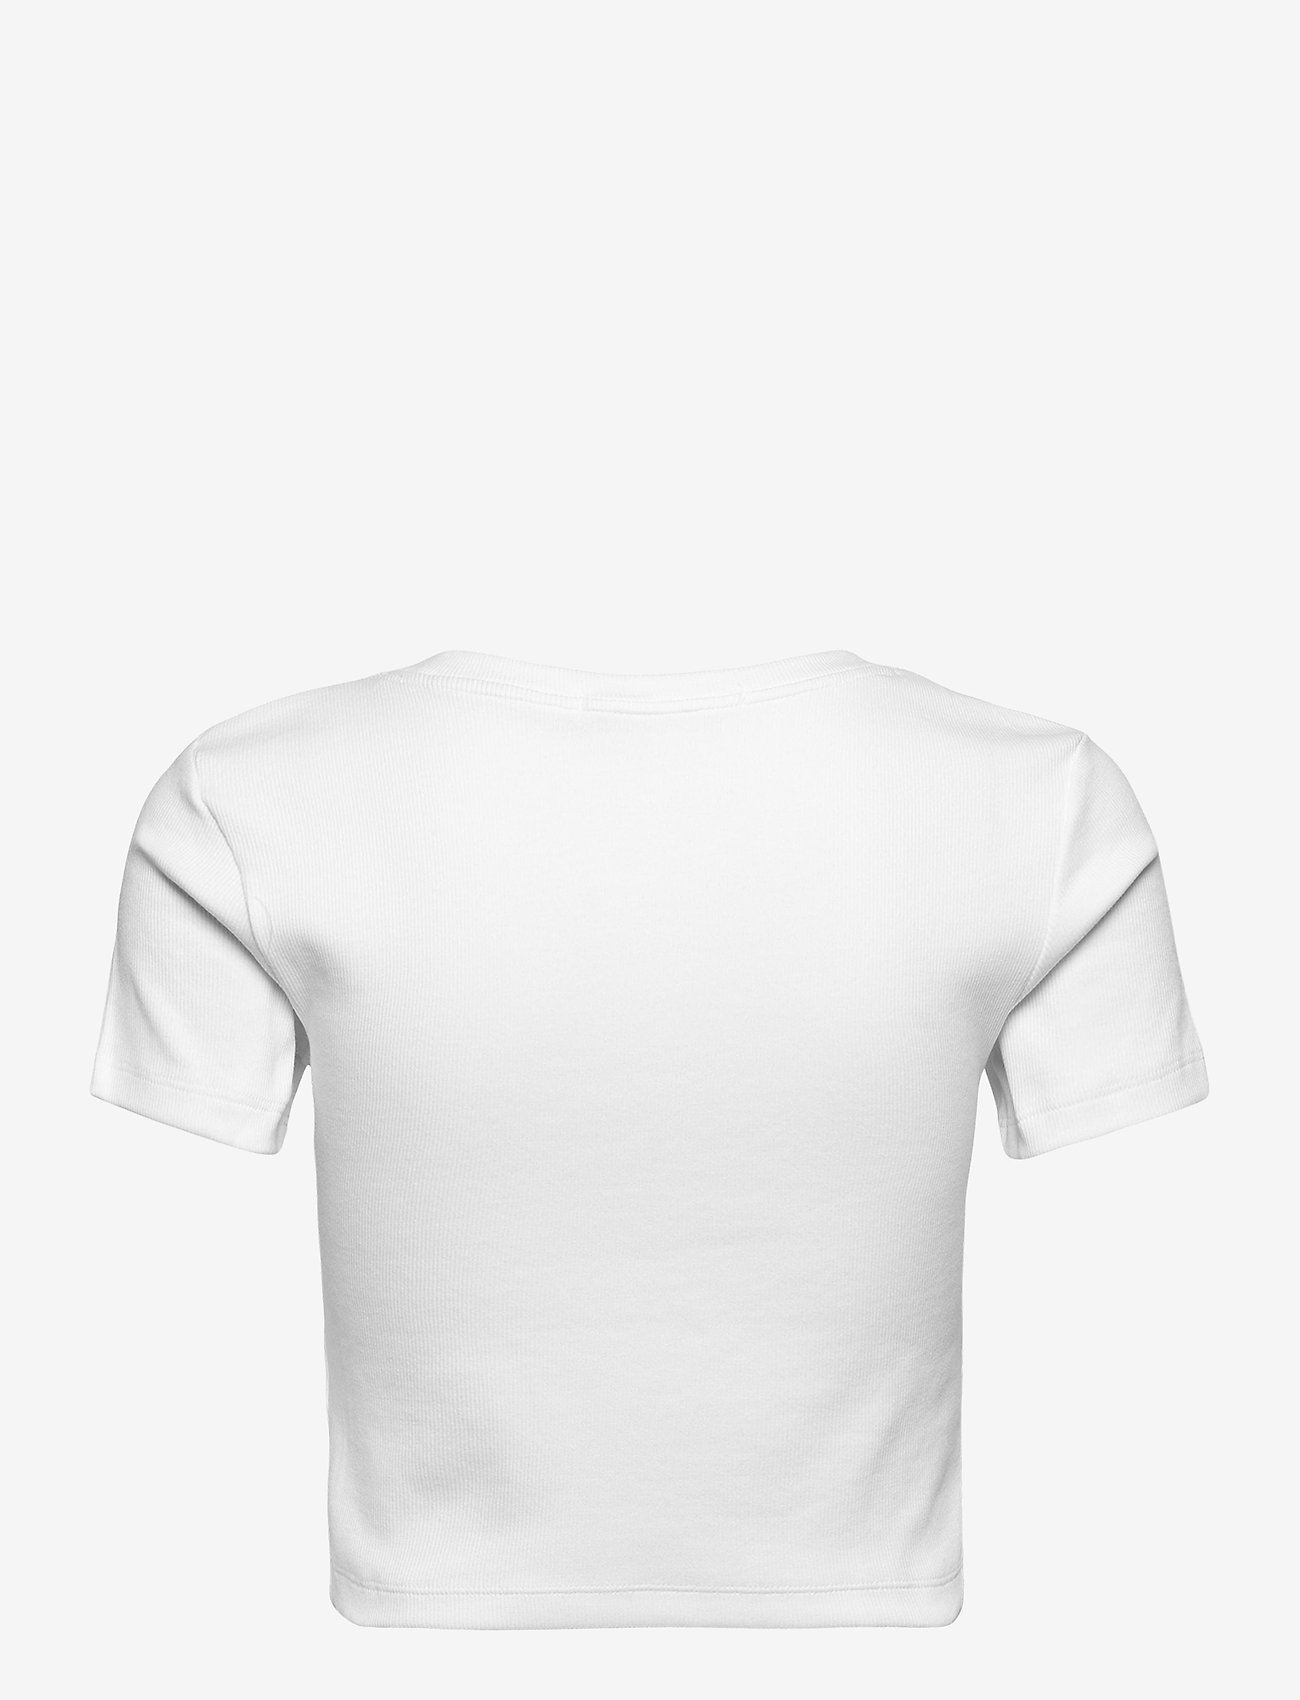 Calvin Klein Jeans - MICRO BRANDING CROP RIB TOP - crop tops - bright white - 1